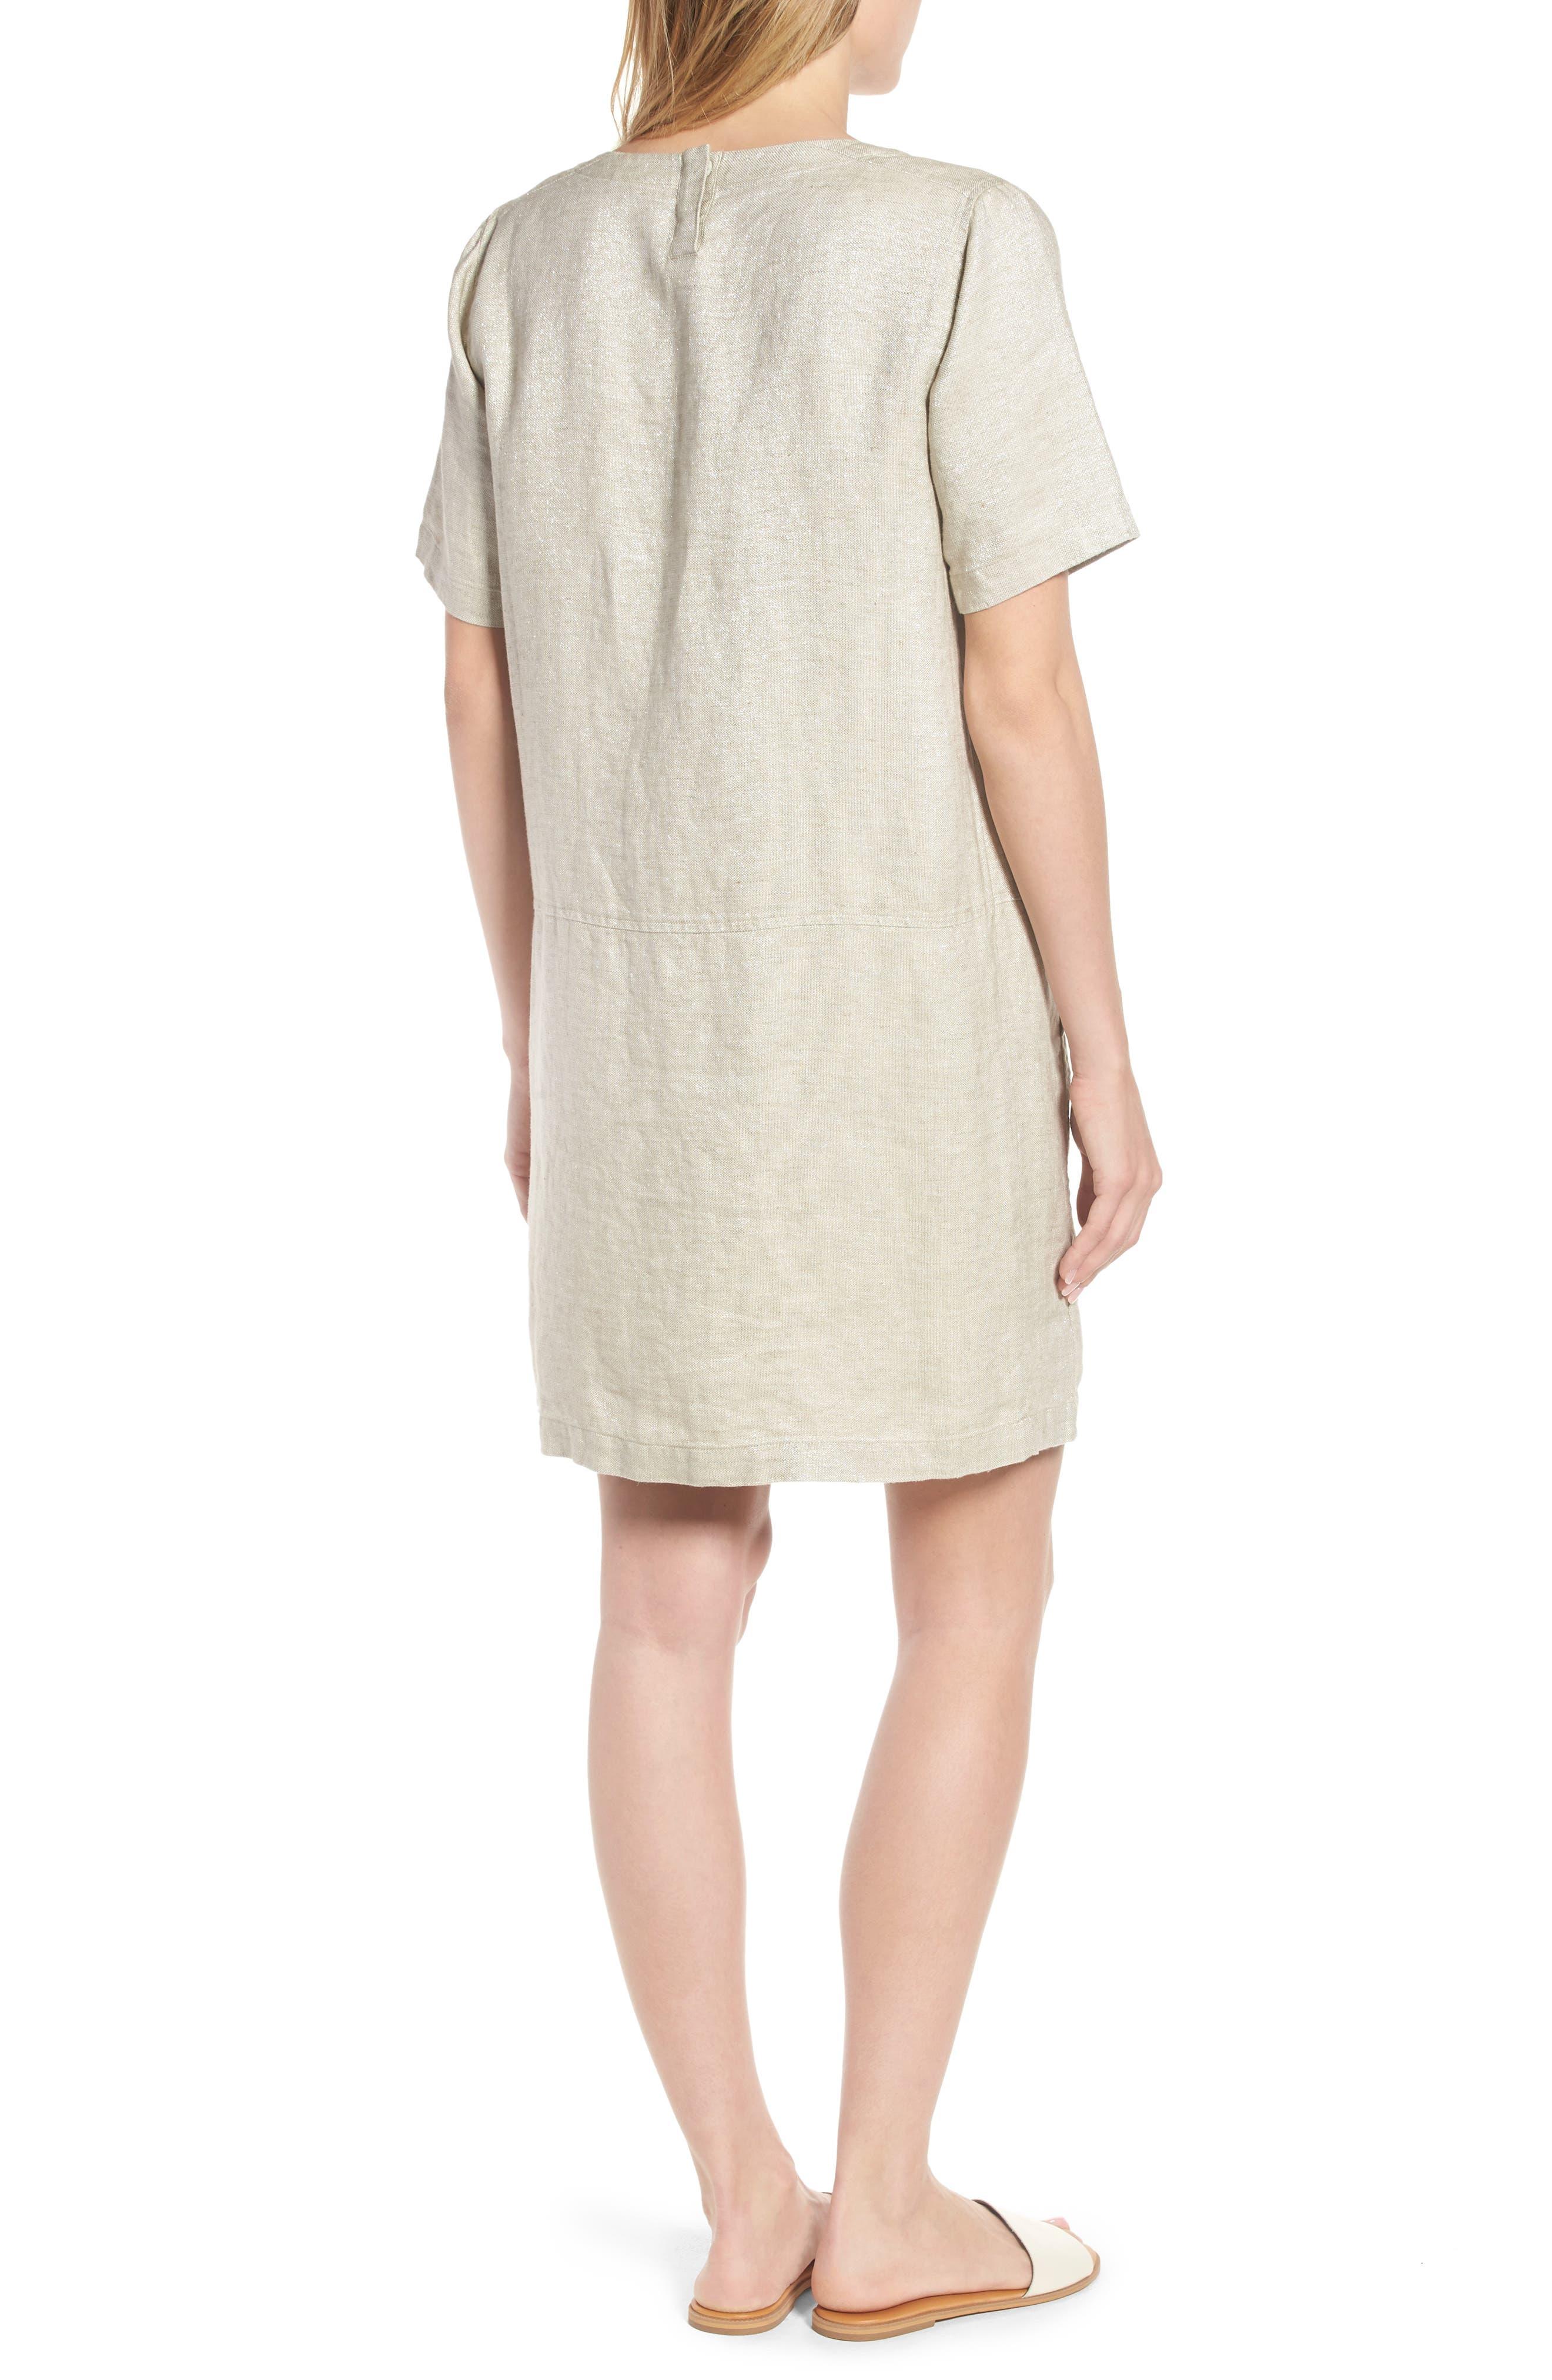 Scoop Neck Linen Blend Dress,                             Alternate thumbnail 2, color,                             257